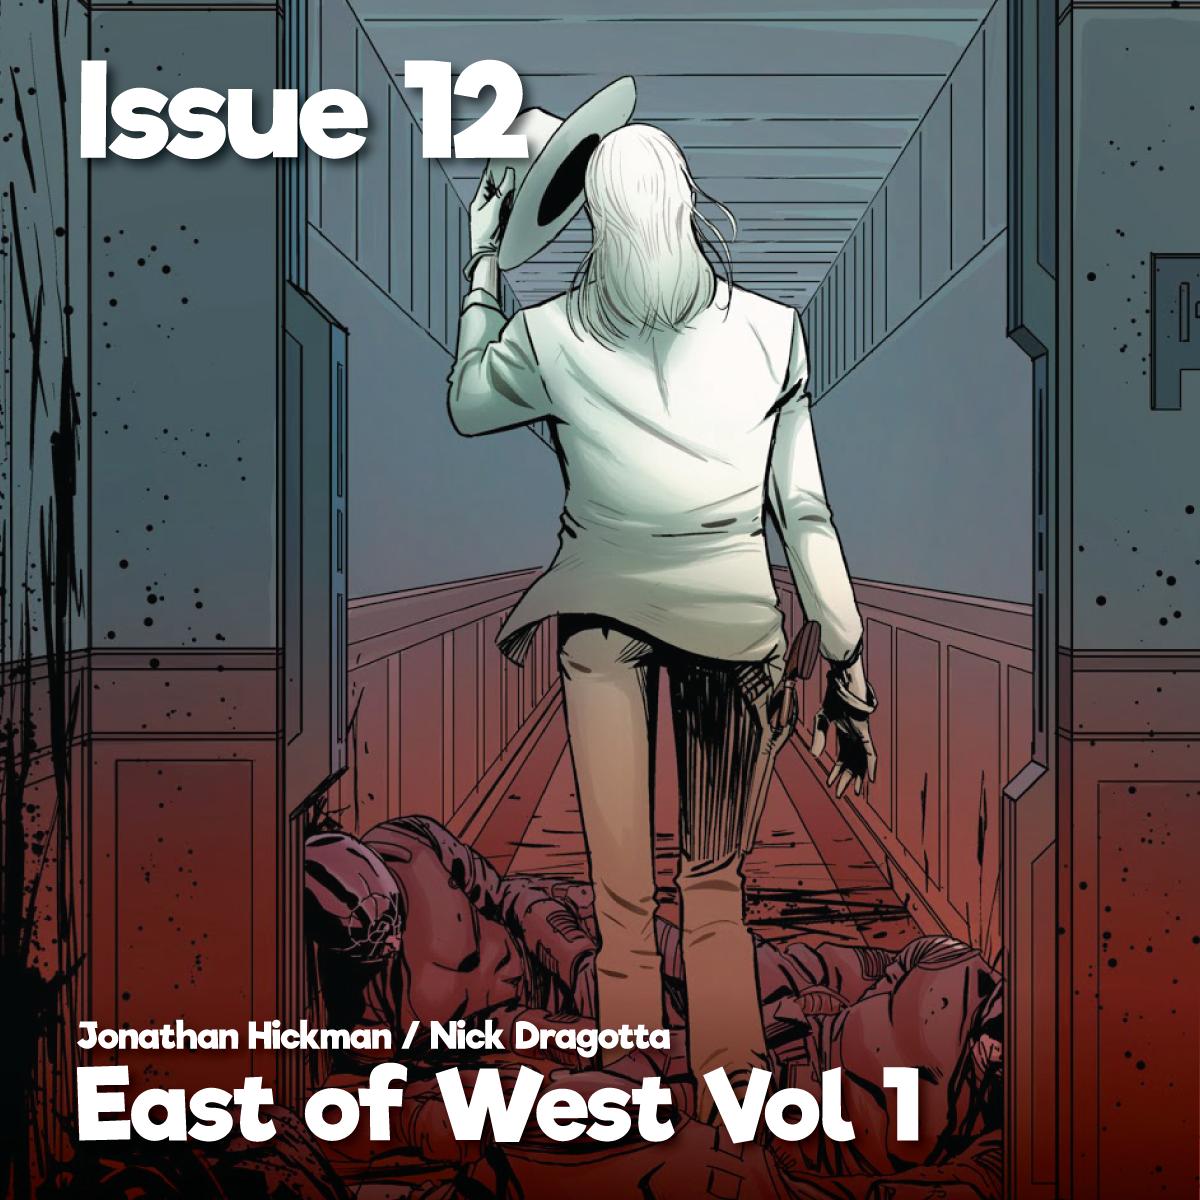 Issue12_EastofWestVol1_1200x1200.png